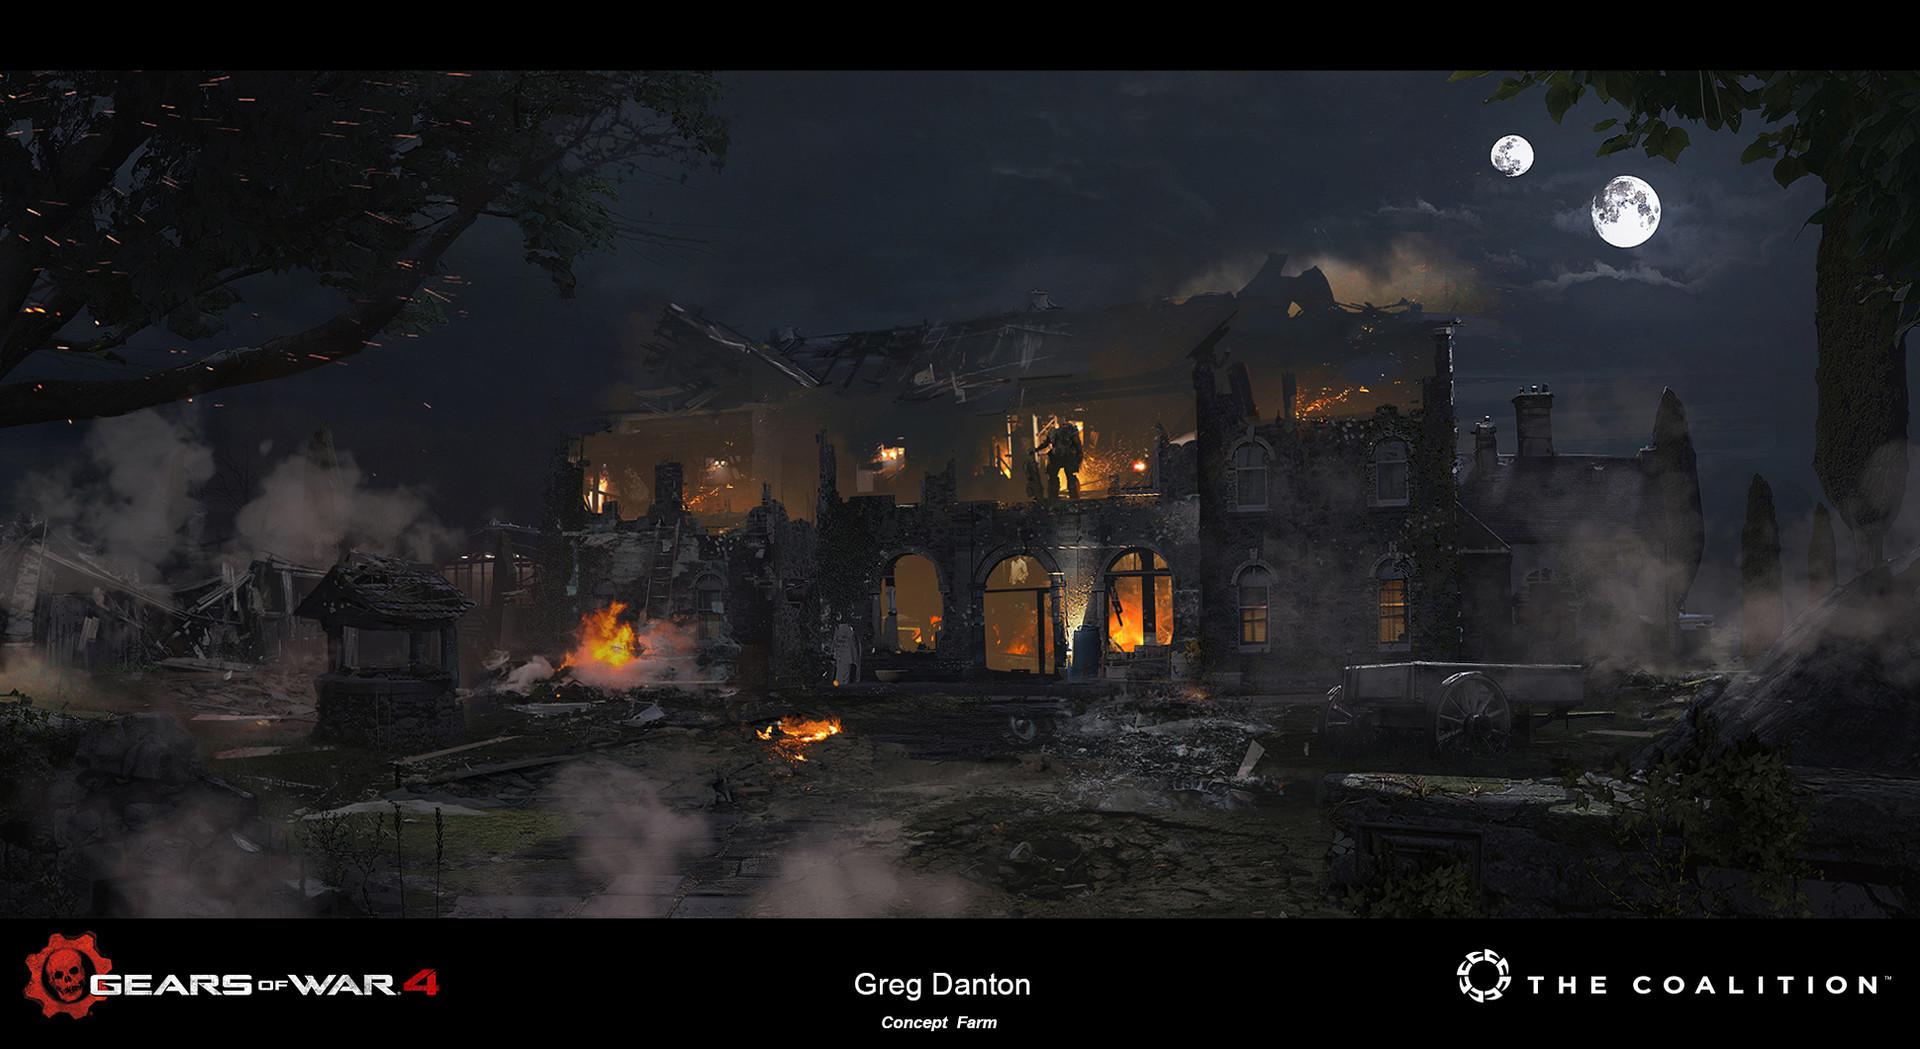 Greg danton art 25